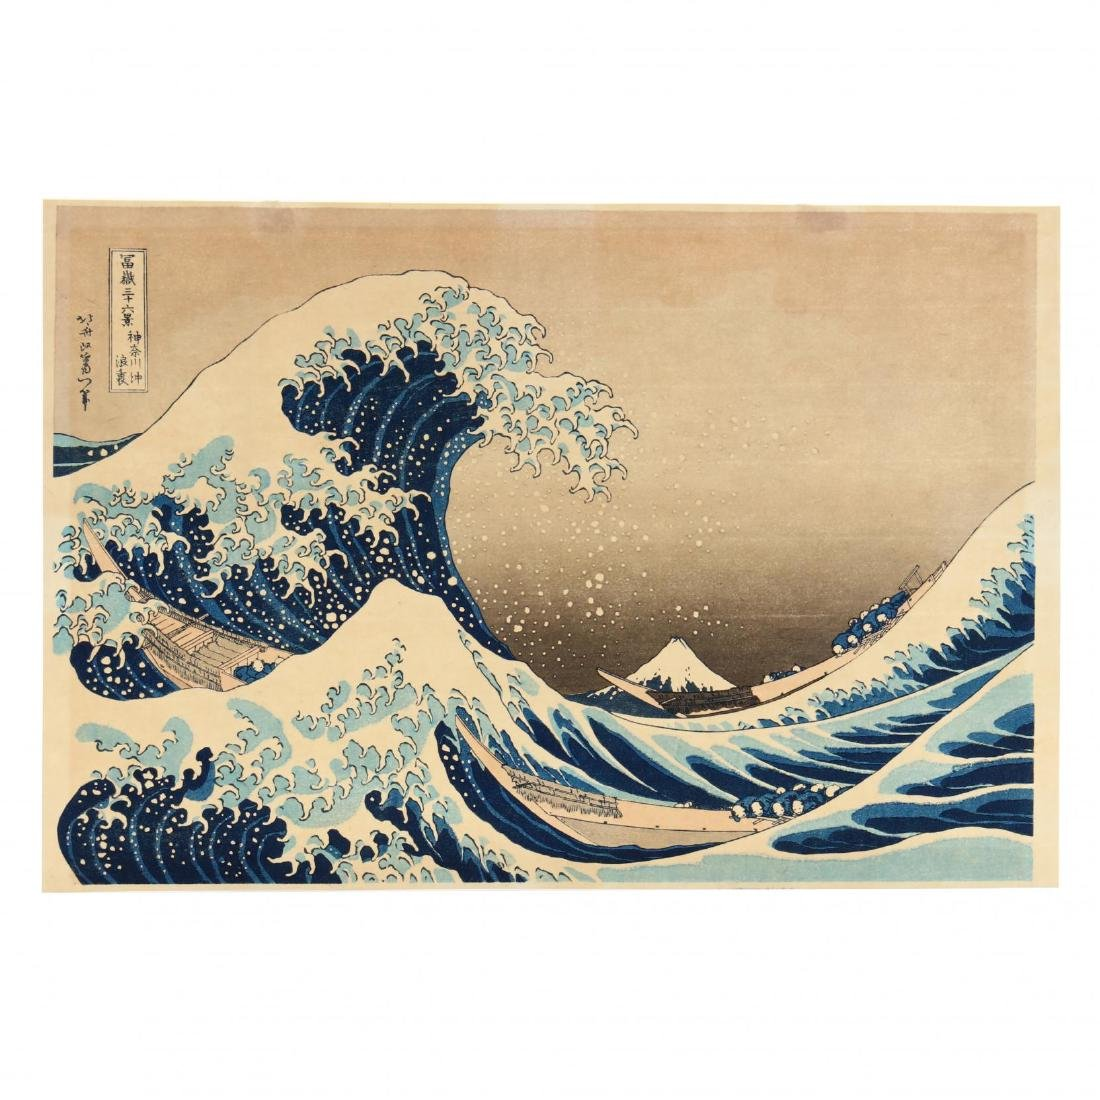 Kanagawa  by Katsushika Hokusai (Japanese, 1760-1849)